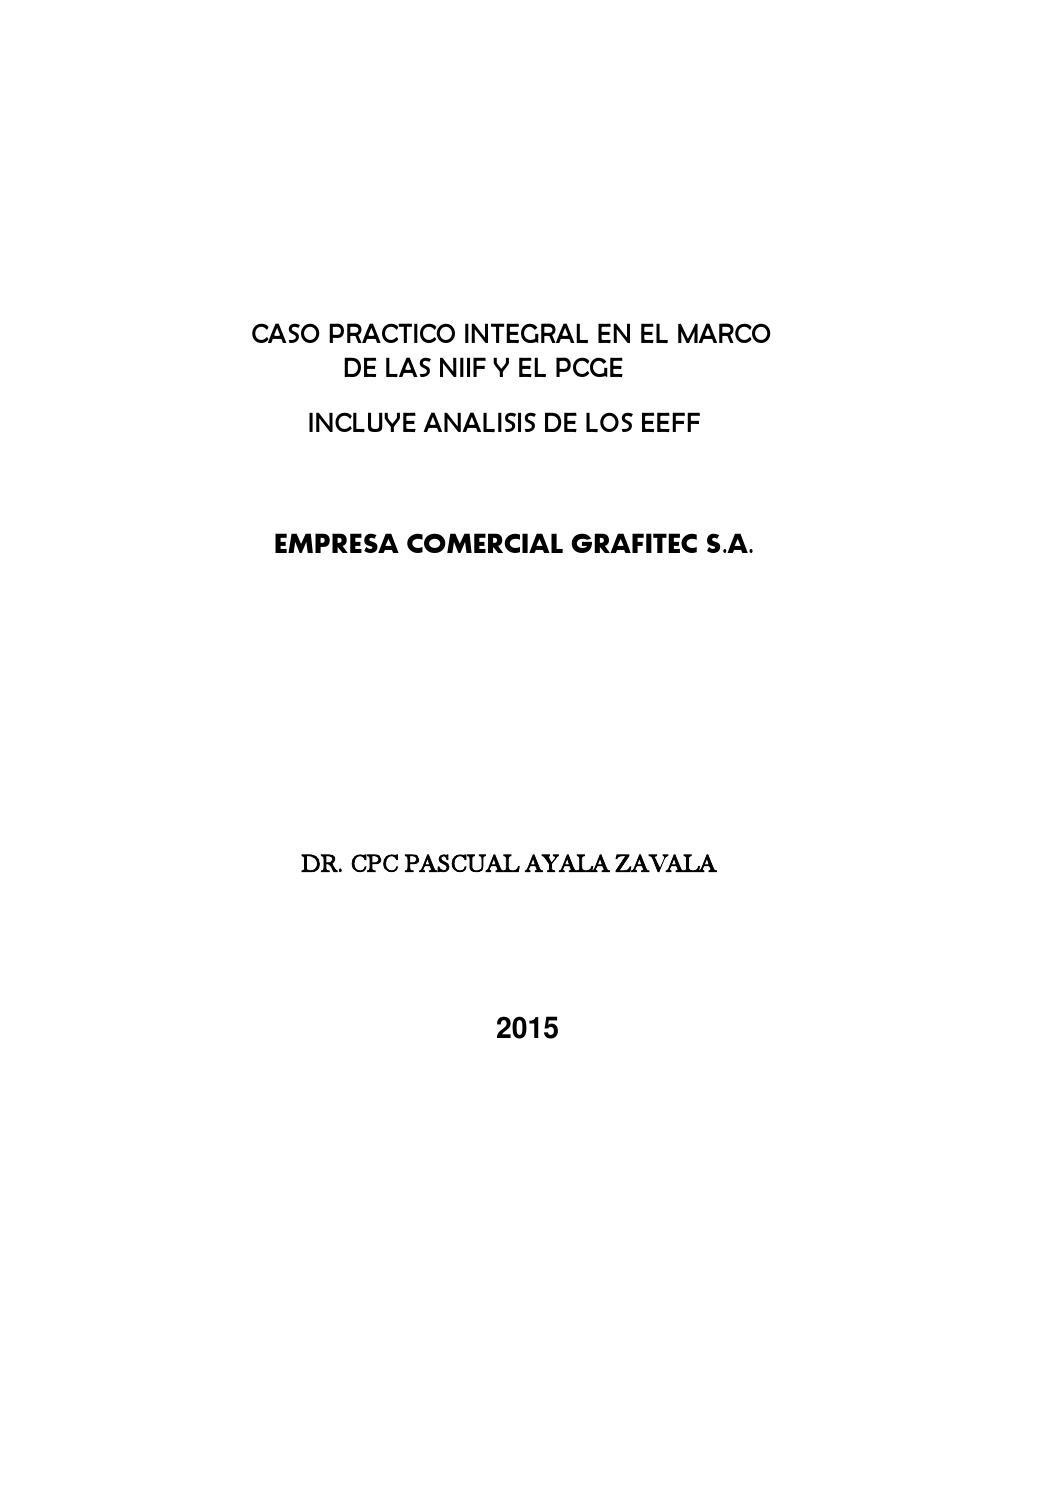 Compra De Utiles De Oficina Asiento Contable.Caso Practico Grafitec S A Completo By Pascual Ayala Issuu